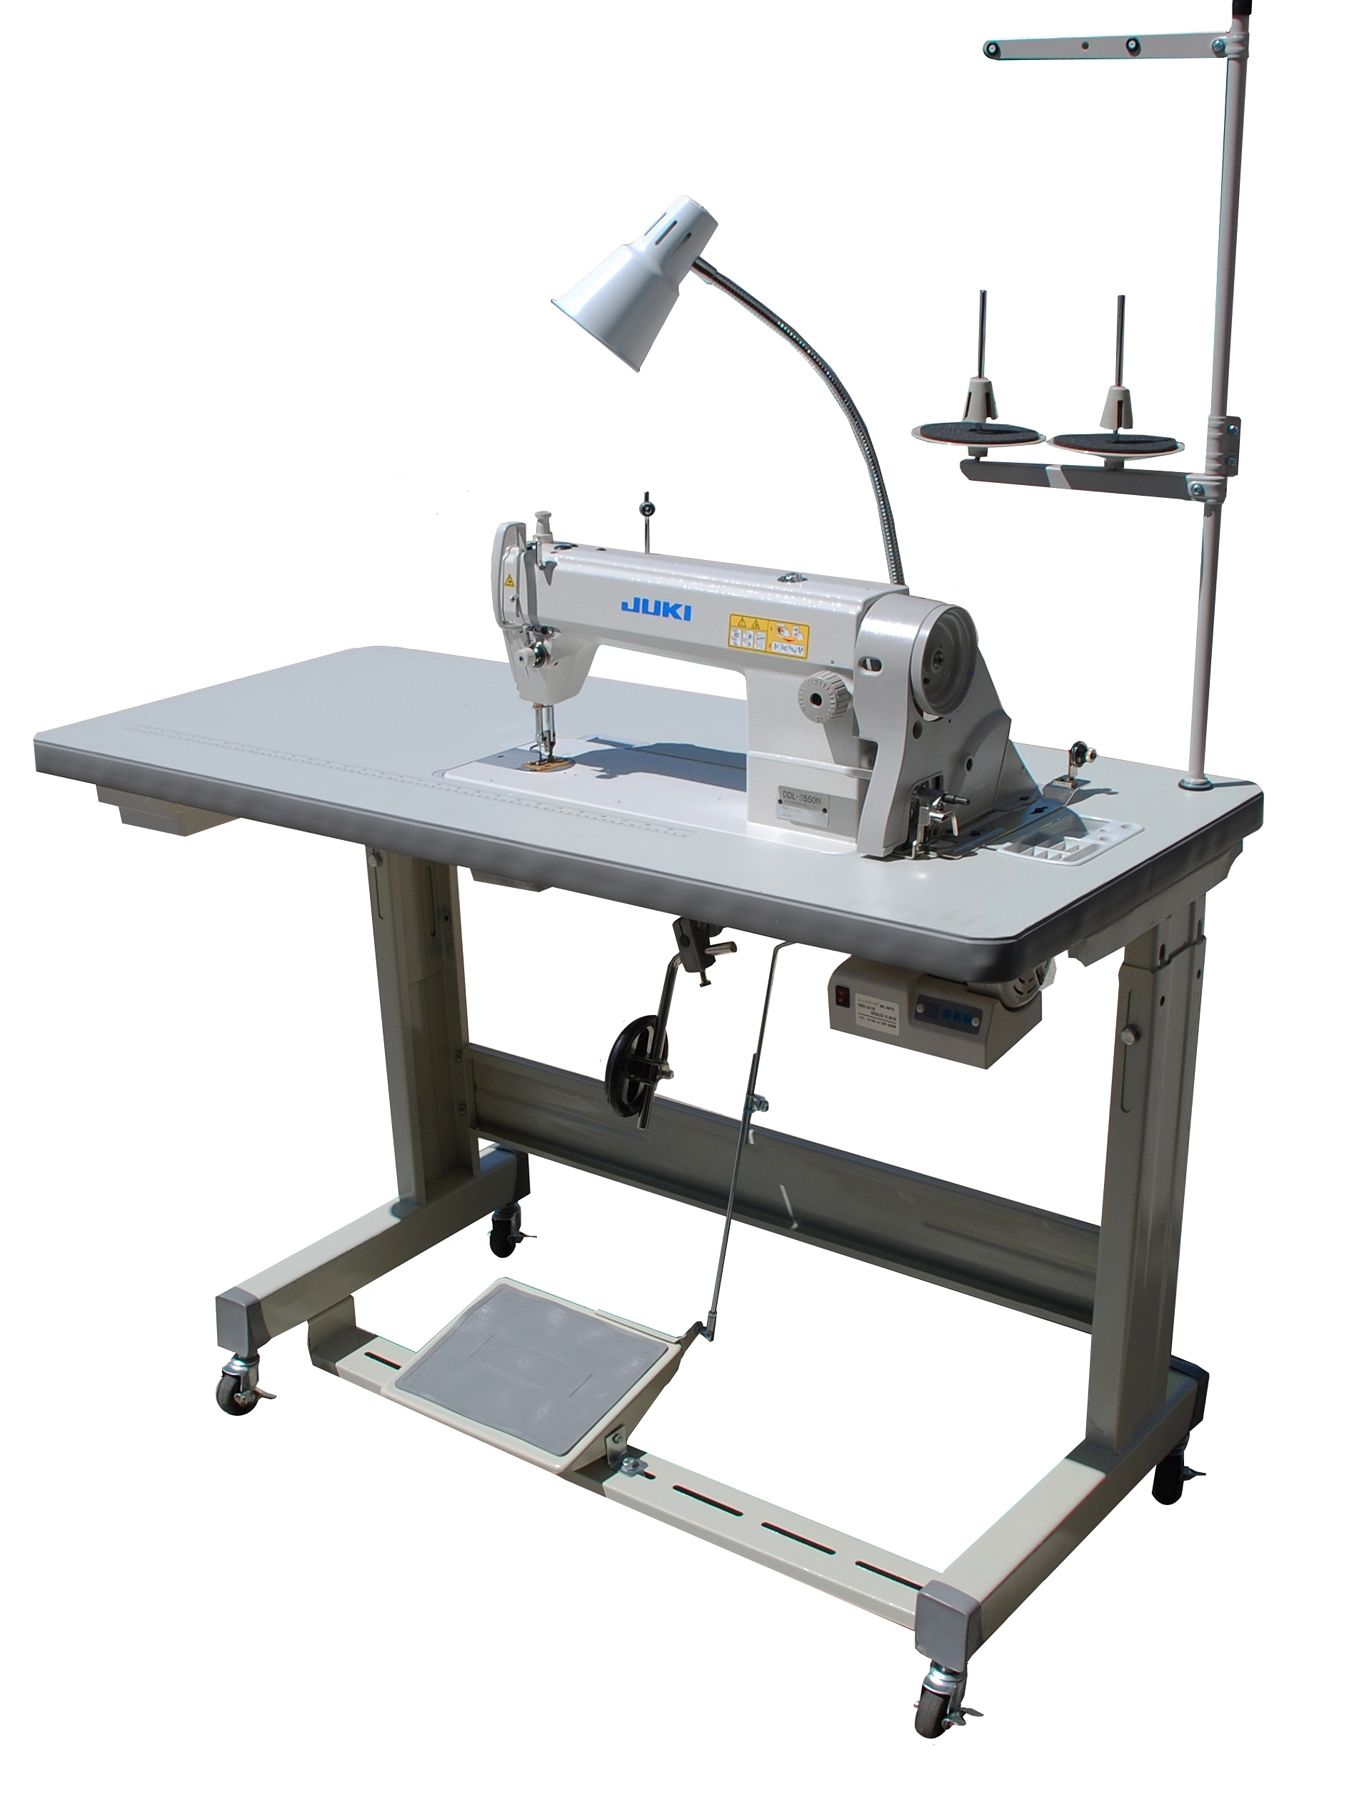 Juki Ddl 5550n Industrial Sewing Machine With Servo Motor